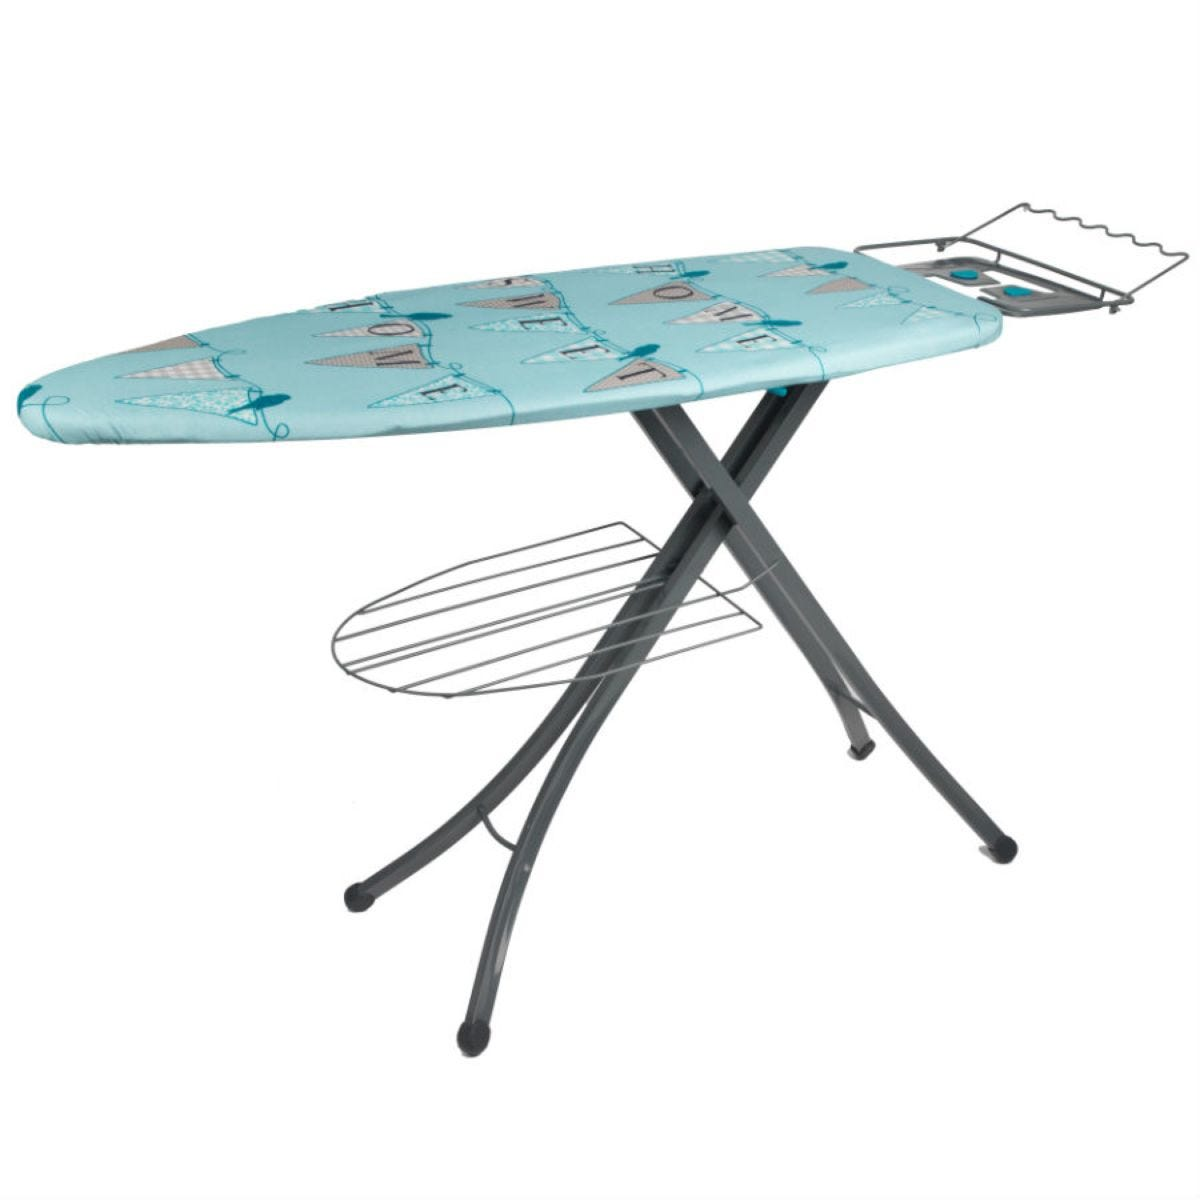 Beldray 126 x 45cm Ironing Board - Home Bird Print